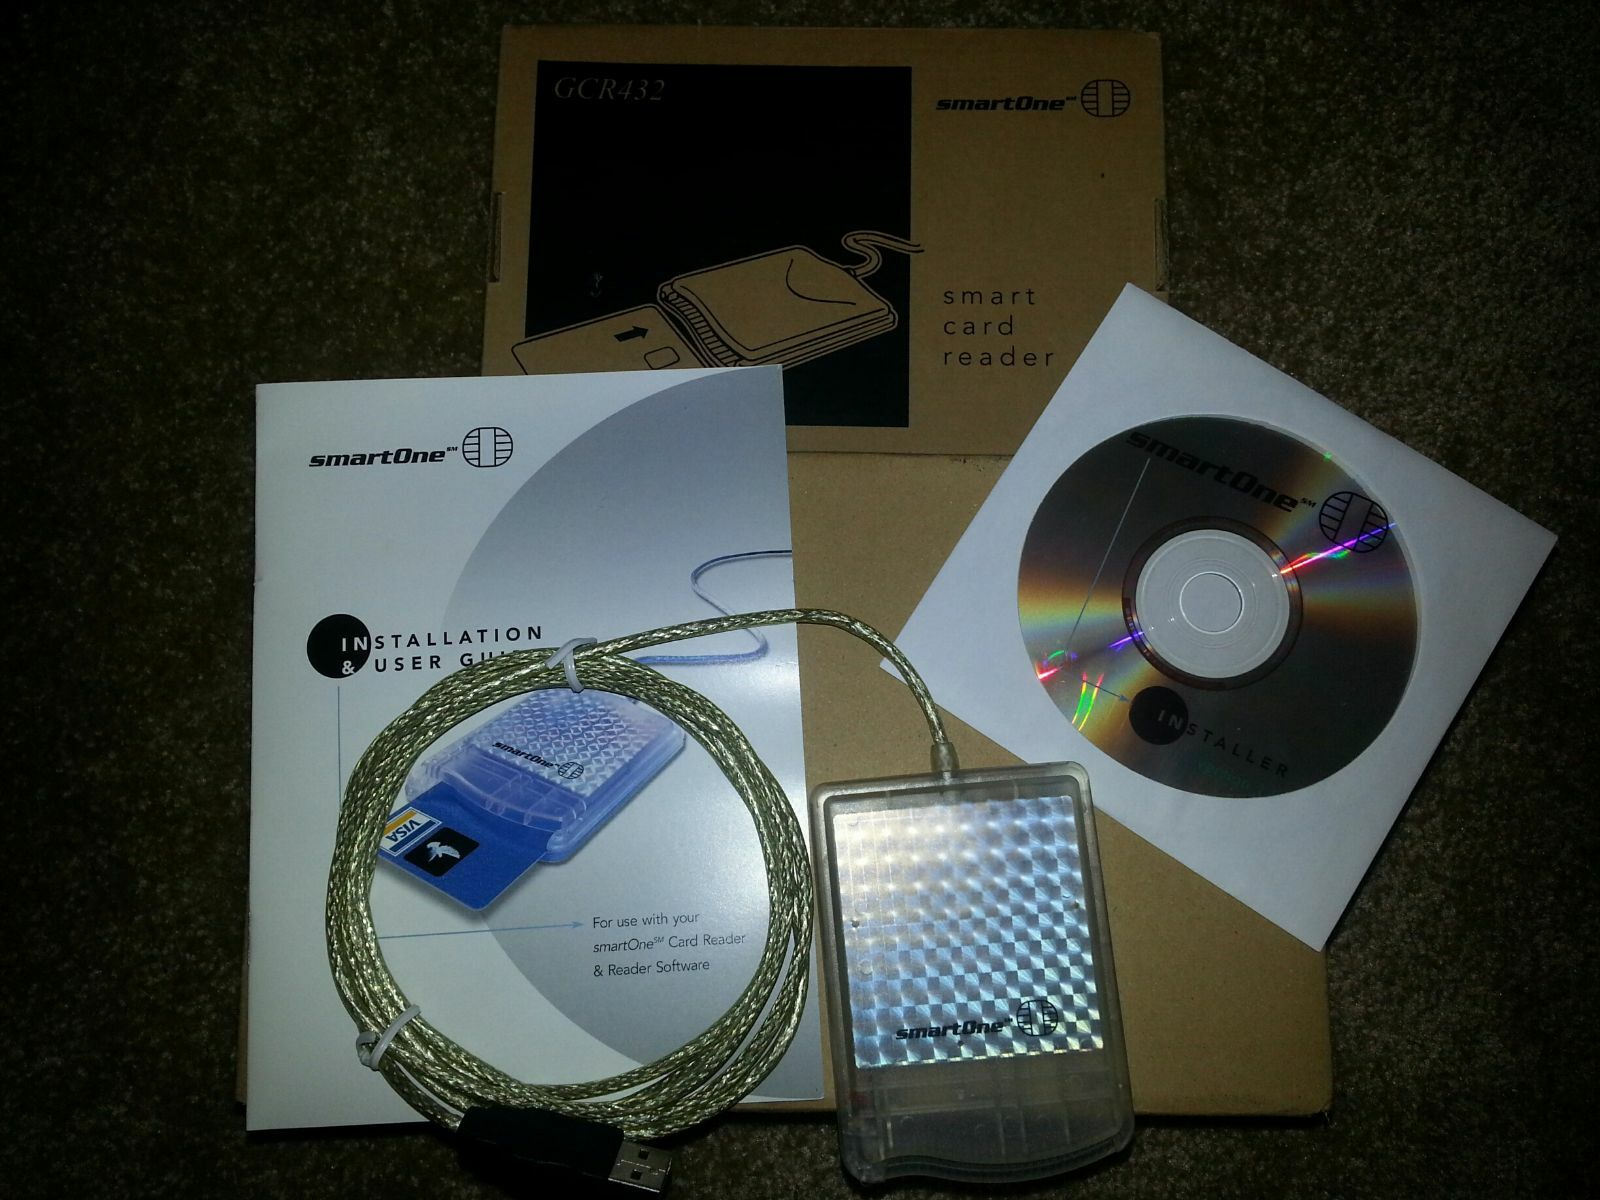 Never Fusion VISA Smart Card Reader Gemplus GCR432 Hwp102847 Bo | eBay